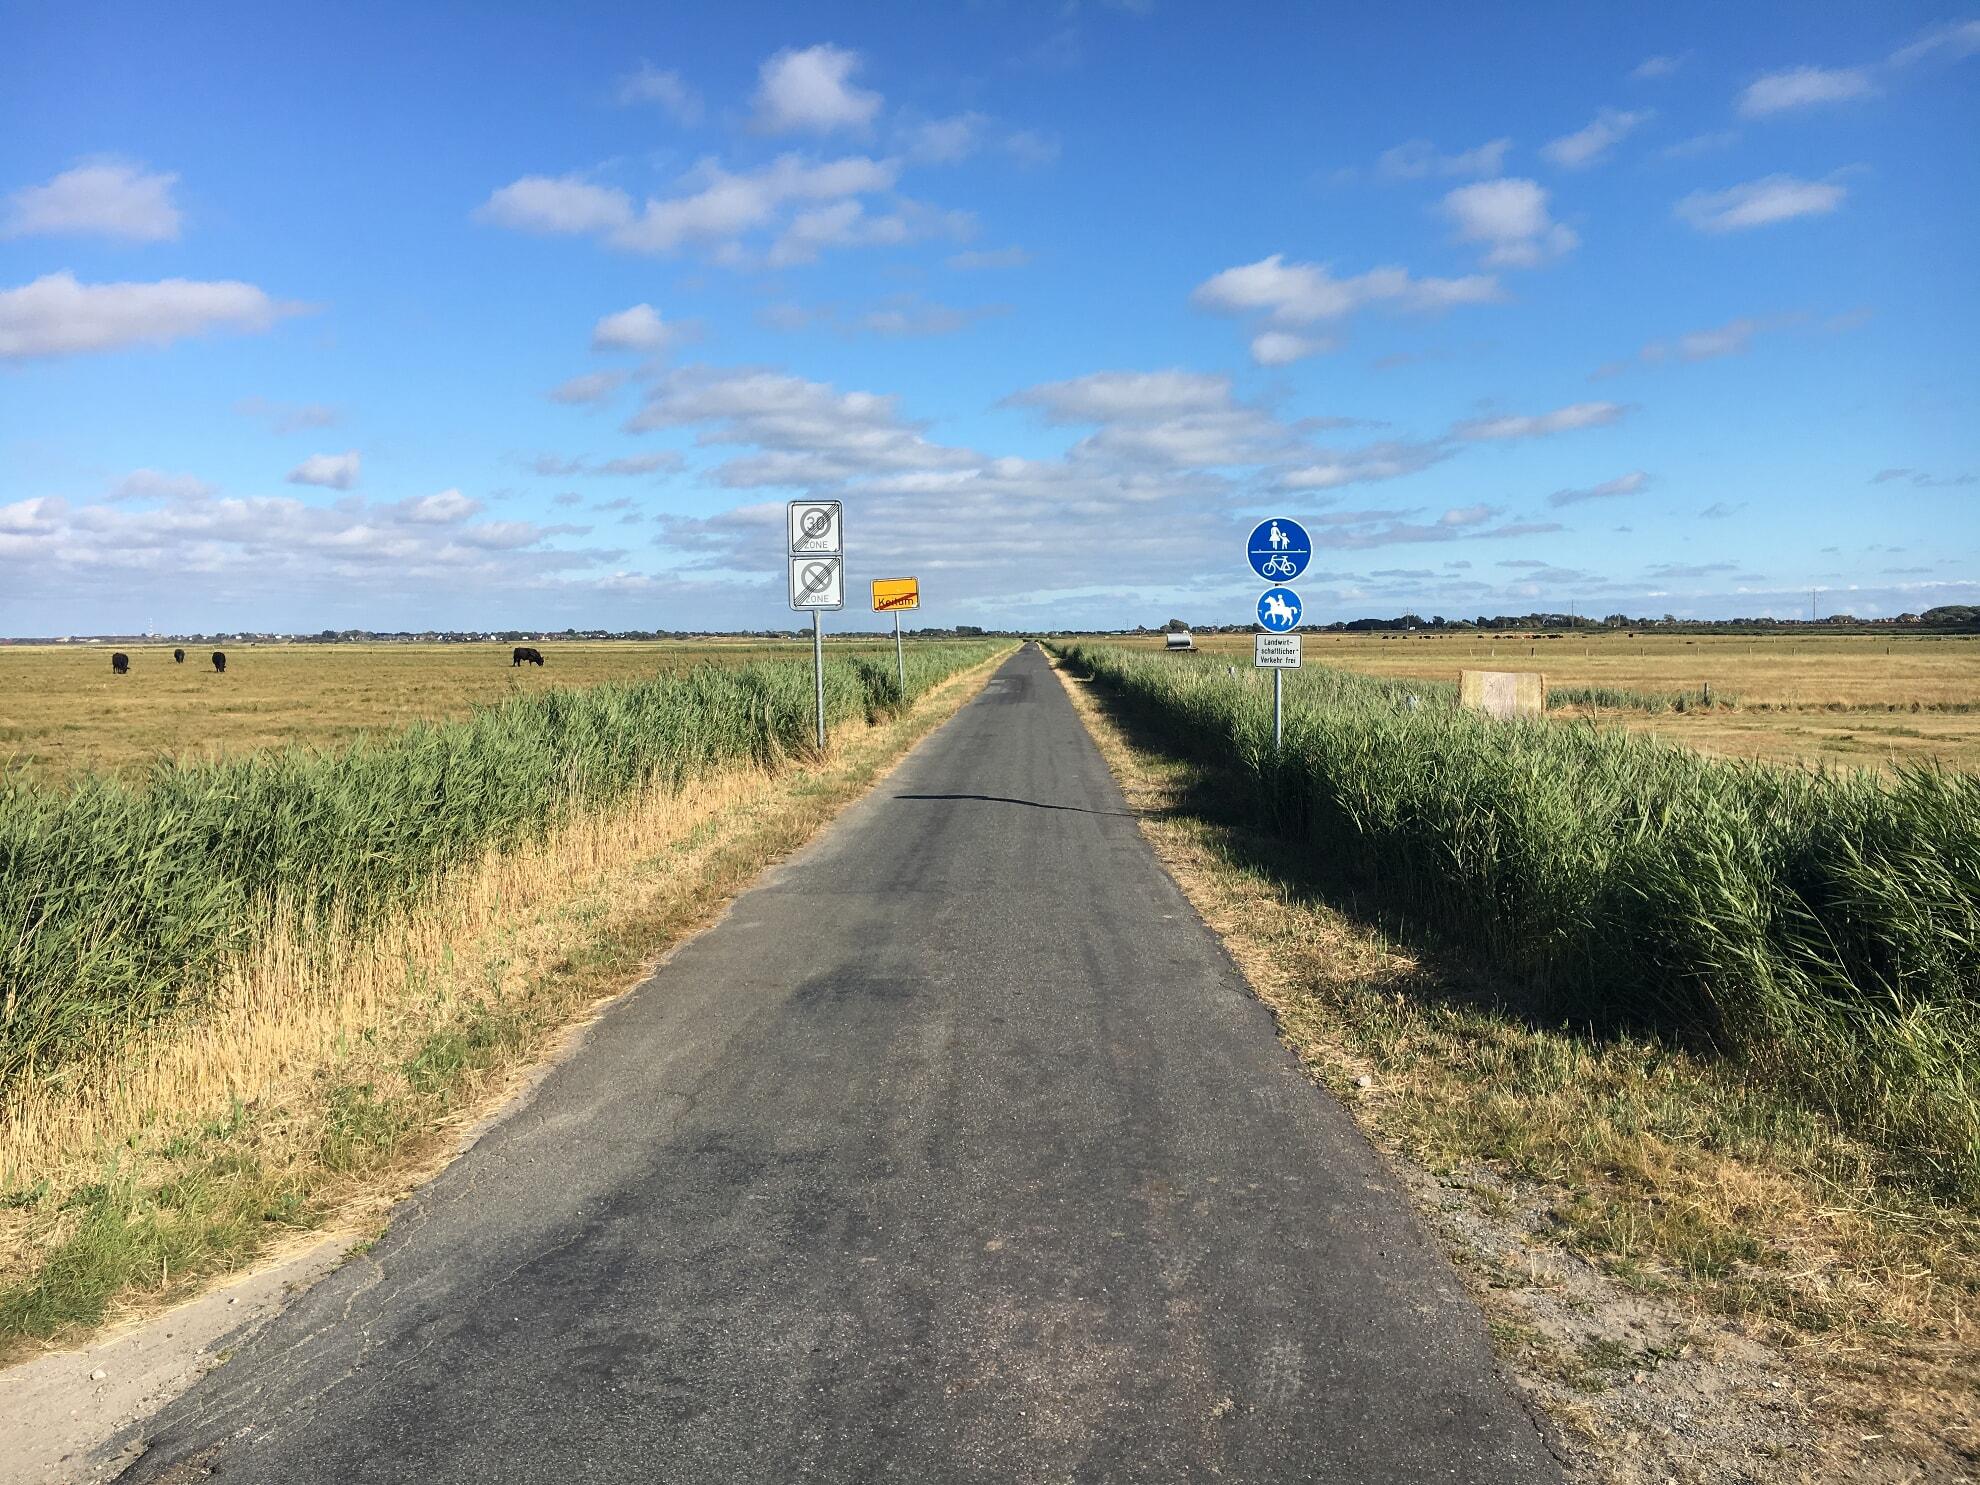 autofreier Weg nach Morsum